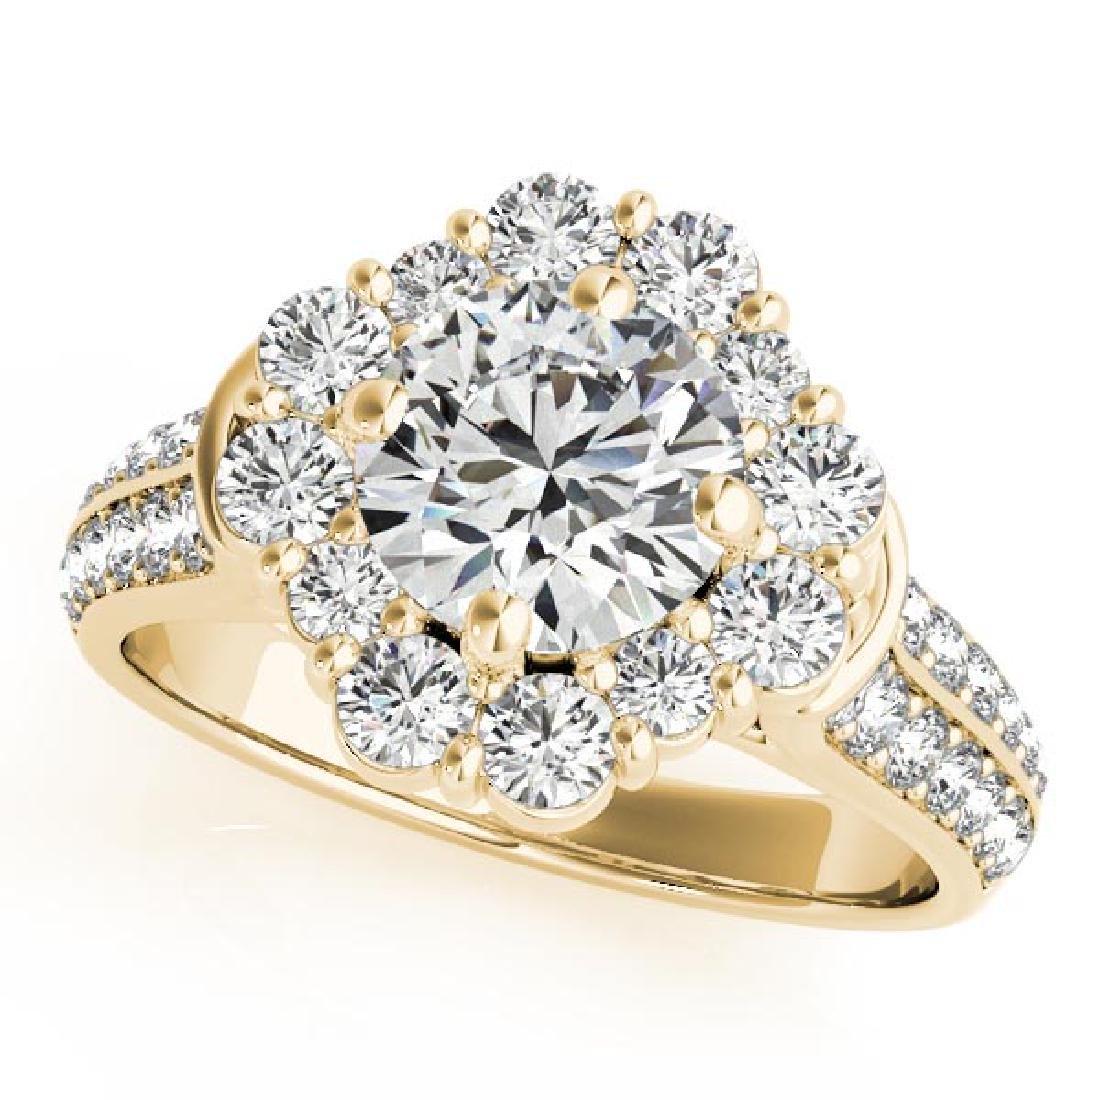 CERTIFIED 18KT WHITE GOLD 1.74 CT G-H/VS-SI1 DIAMOND HA